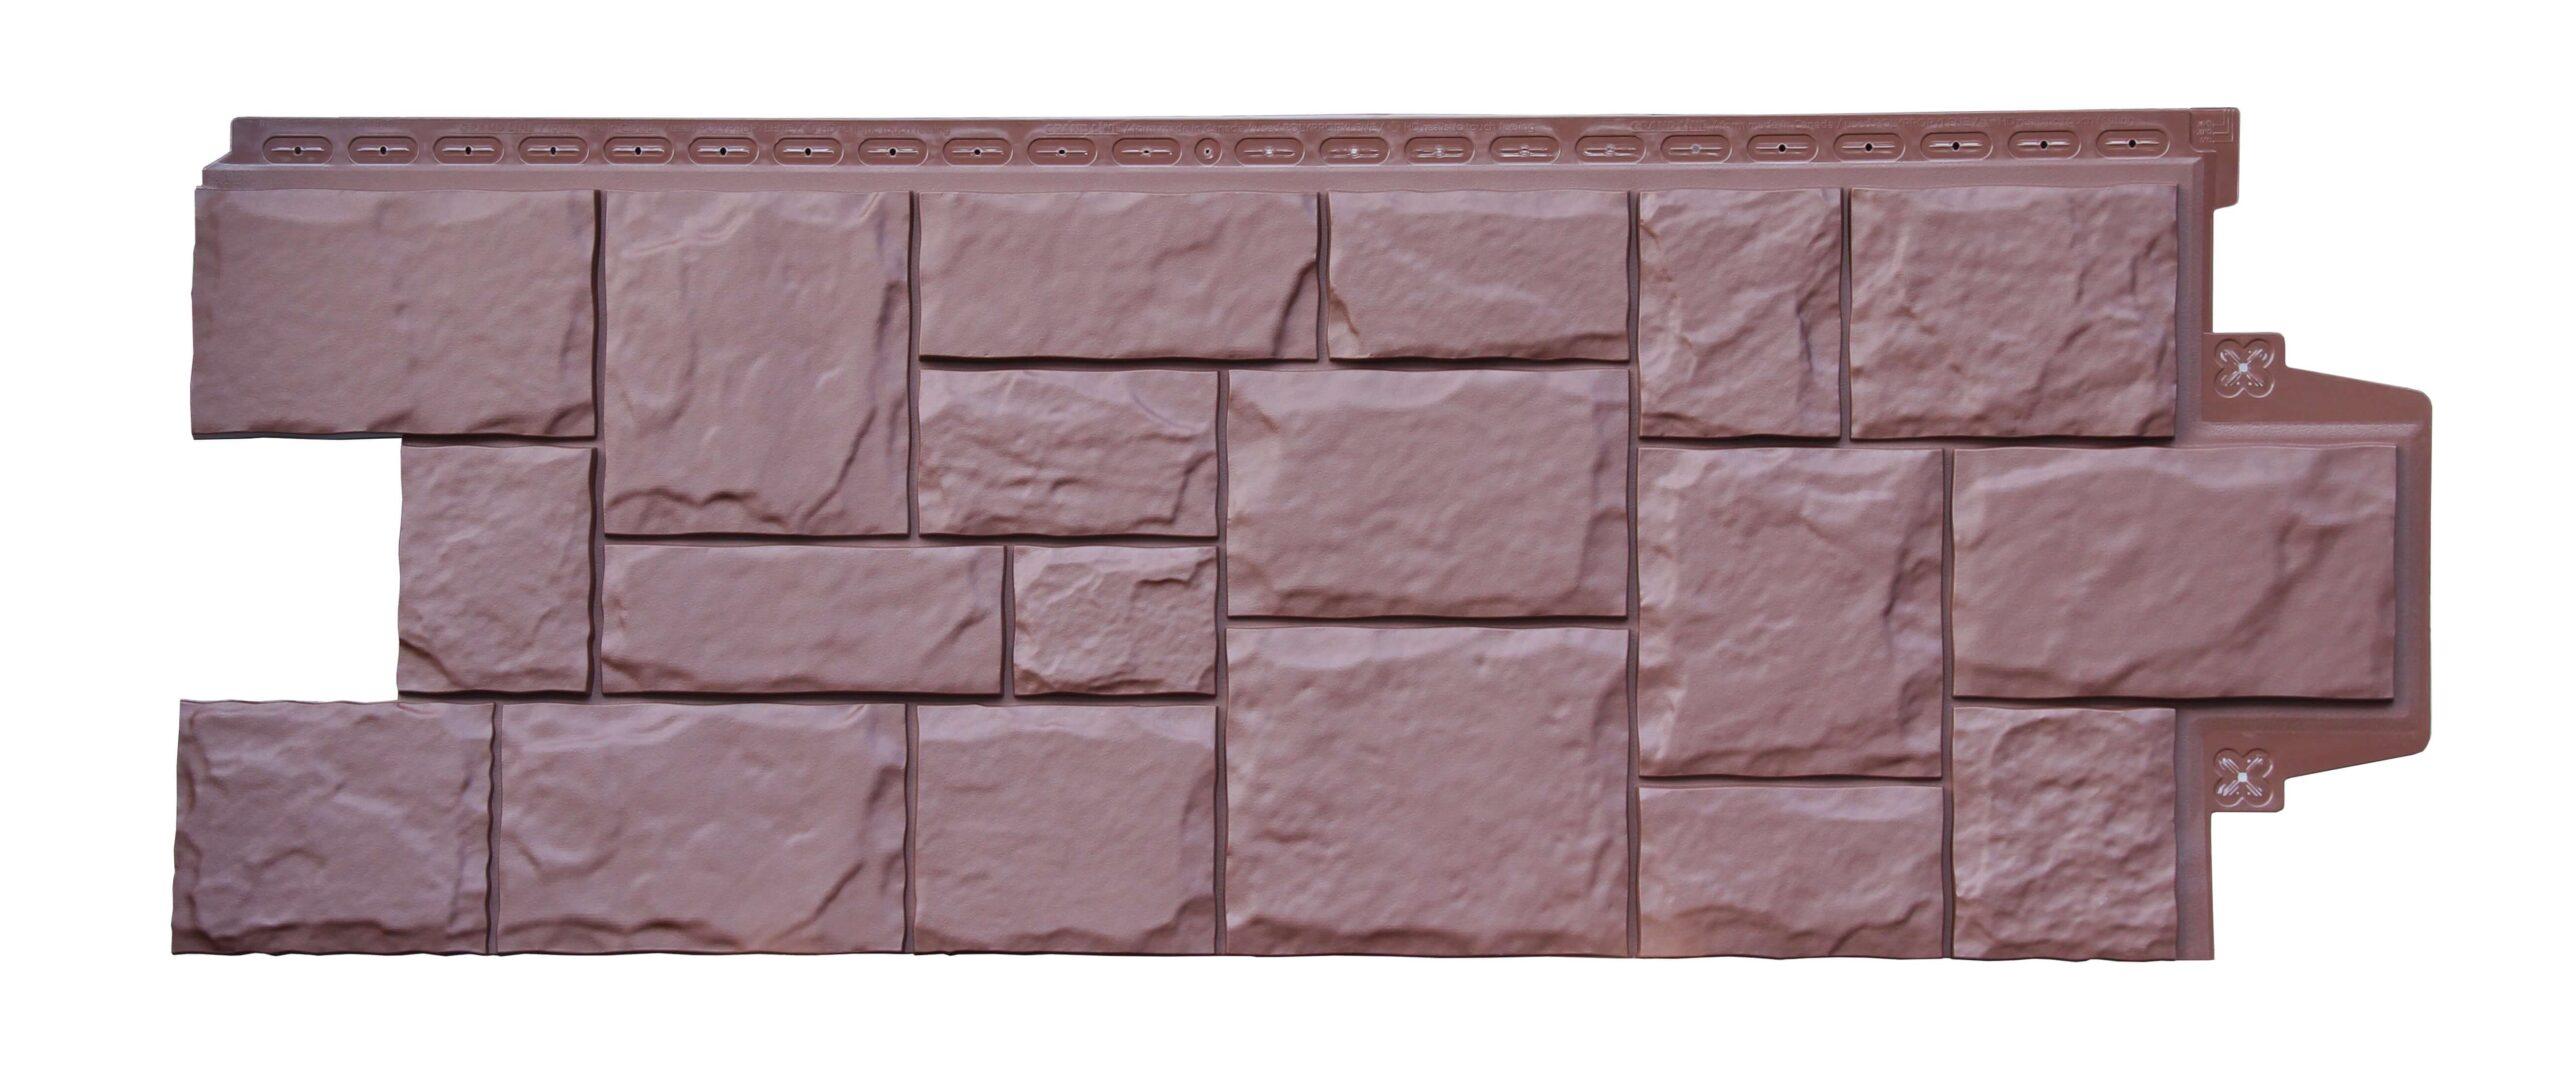 Фасадная панель Grand Line Крупный камень Стандарт земля